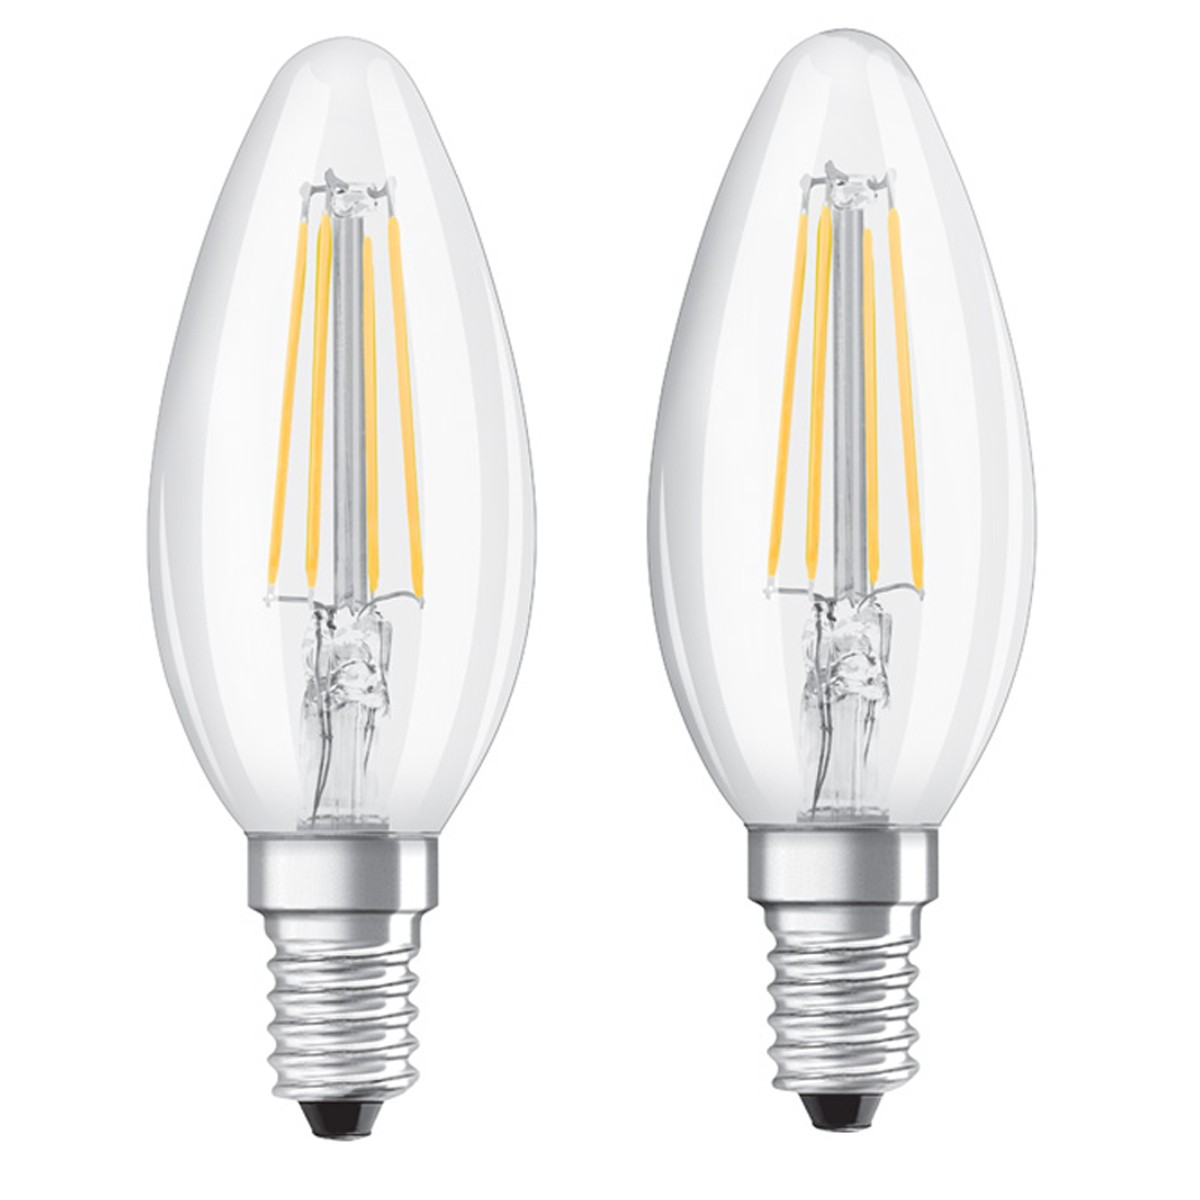 Osram E14 LED Kerze Base Filament Classic 4W 470Lm warmweiss Doppelpack